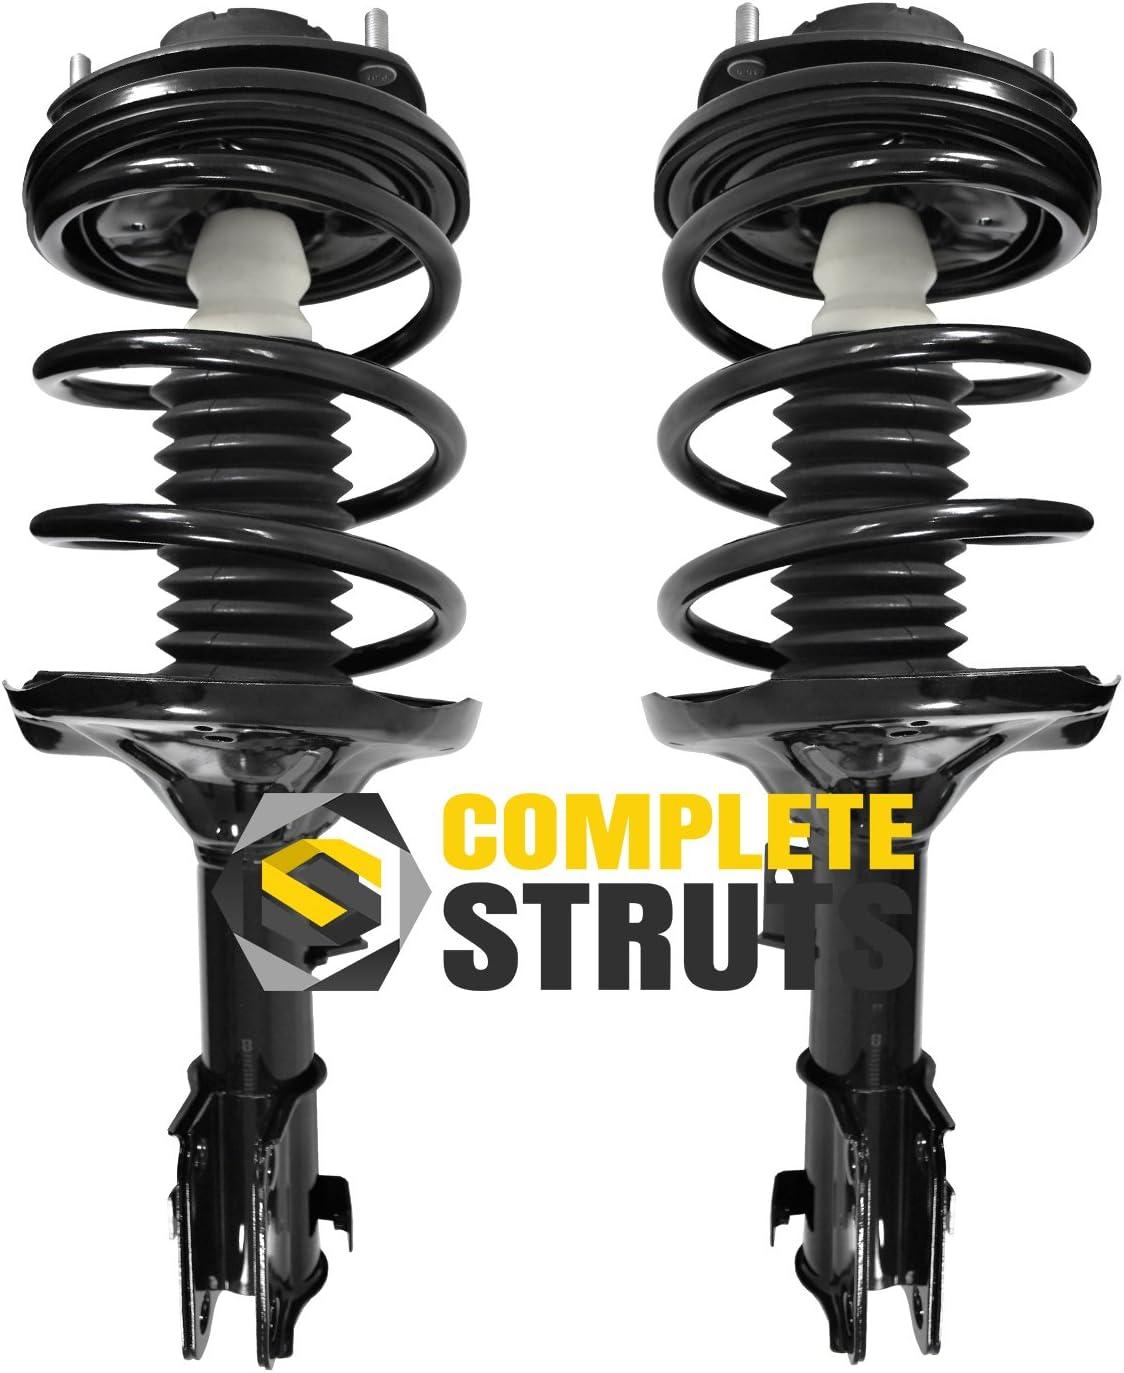 Eclipse Sebring /& Stratus Front Quick Complete Struts /& Coil Spring Assemblies